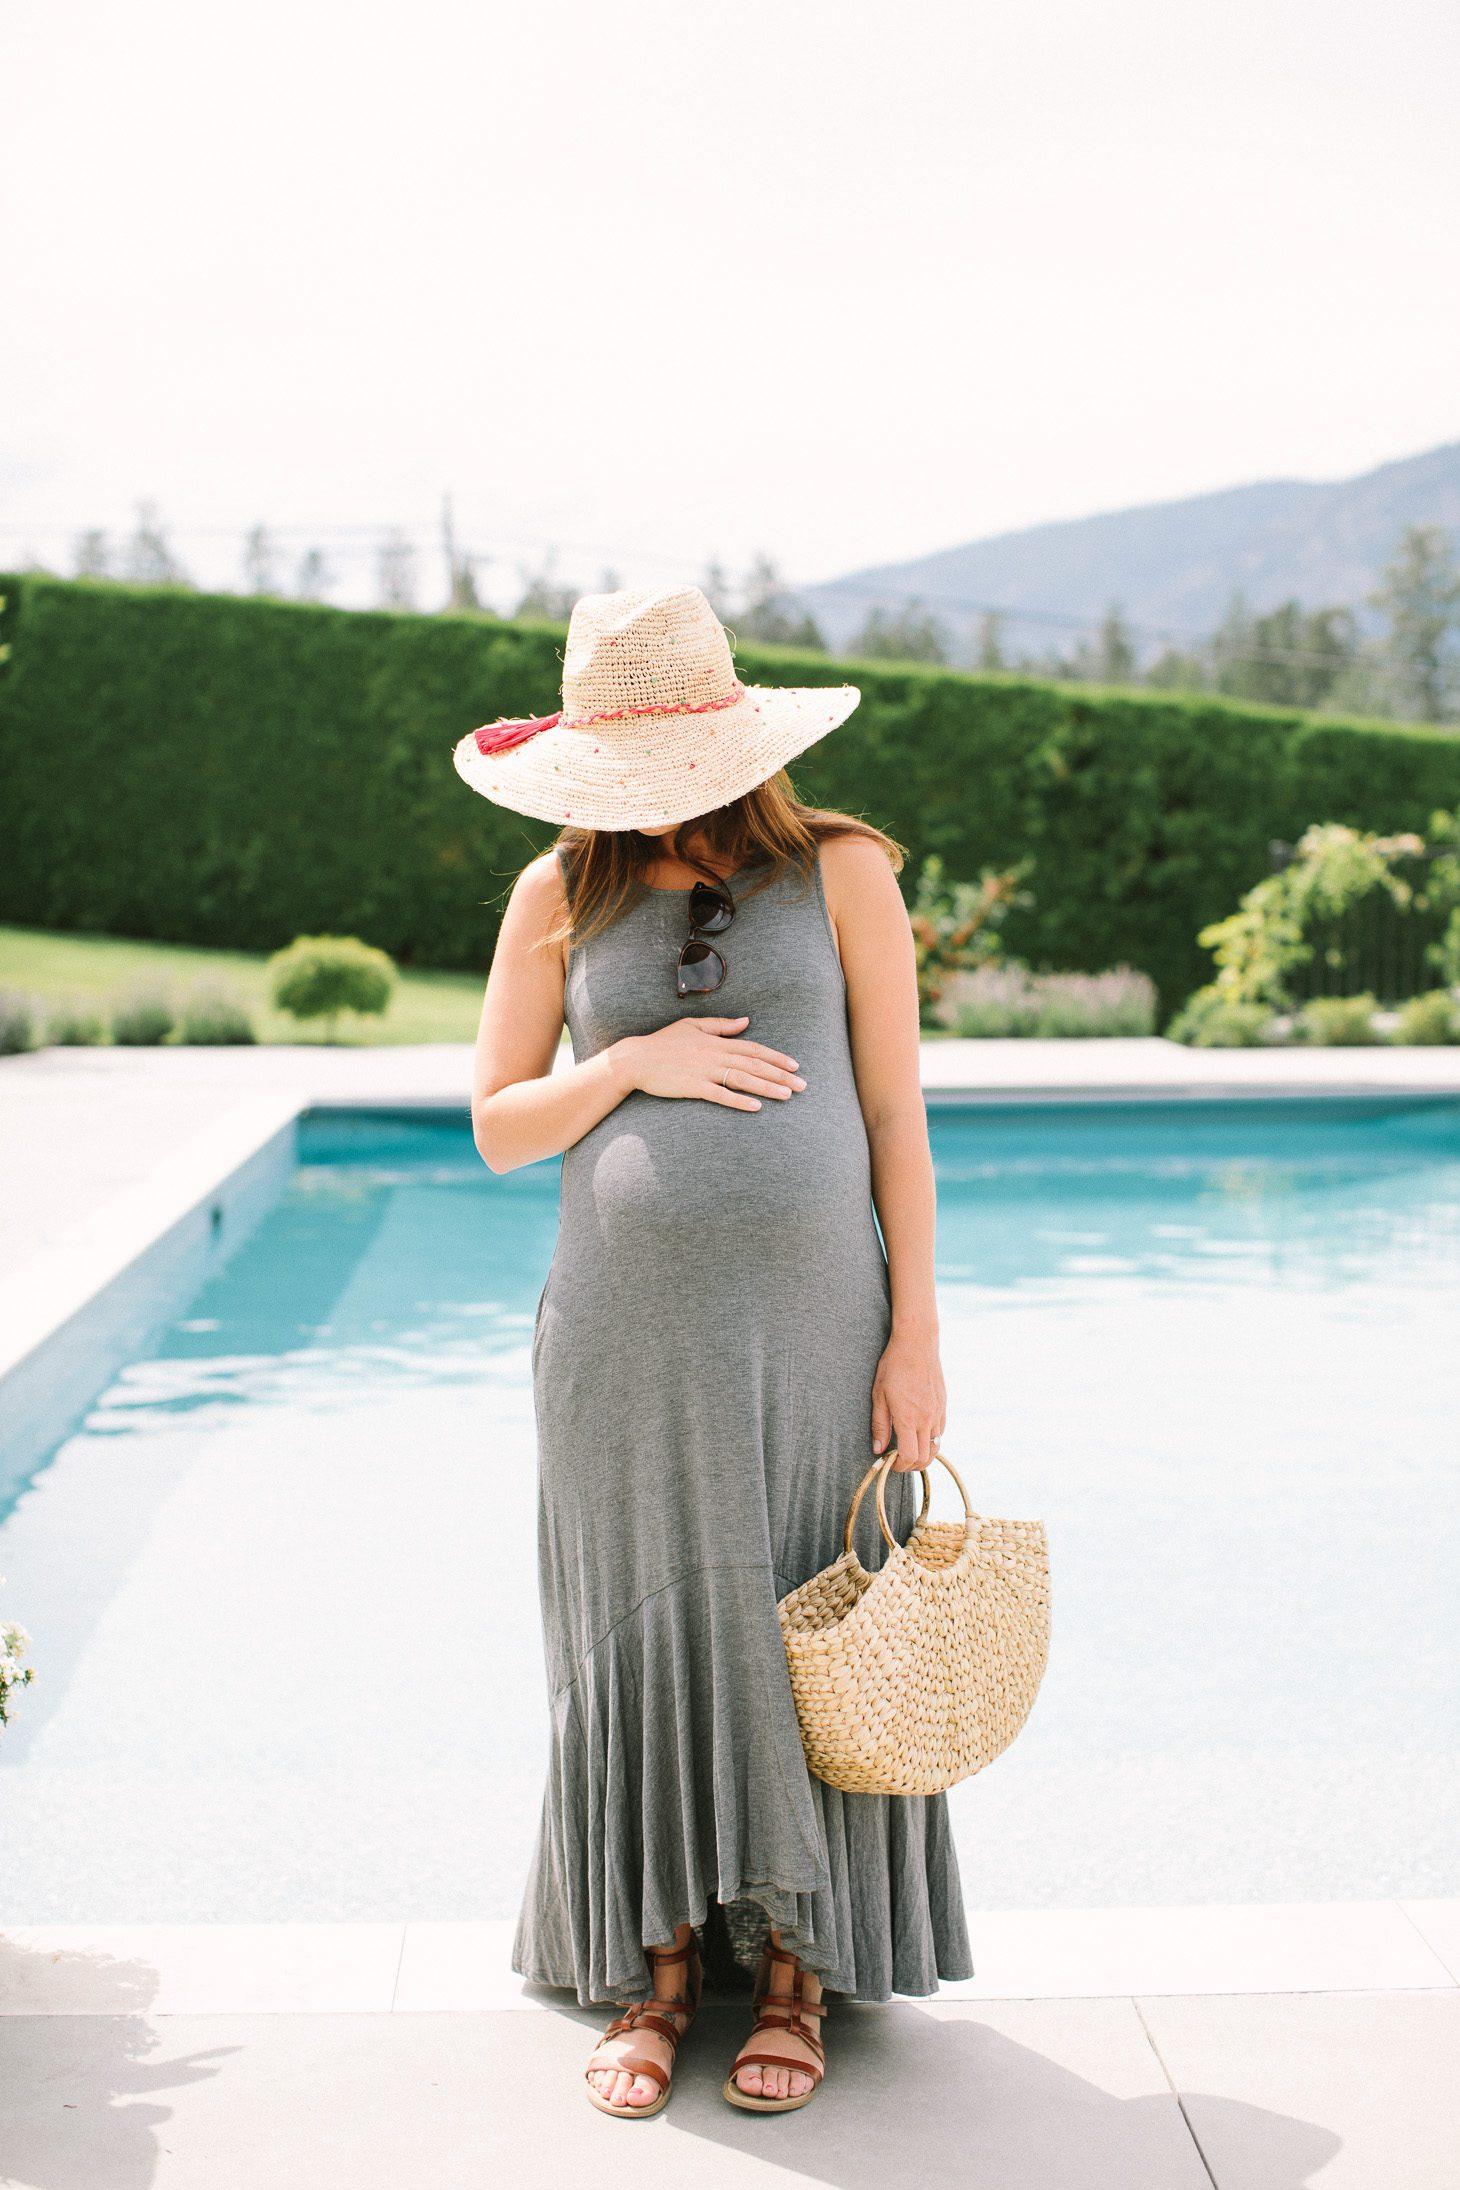 Jillian Harris The Dress I Want to Give Birth In